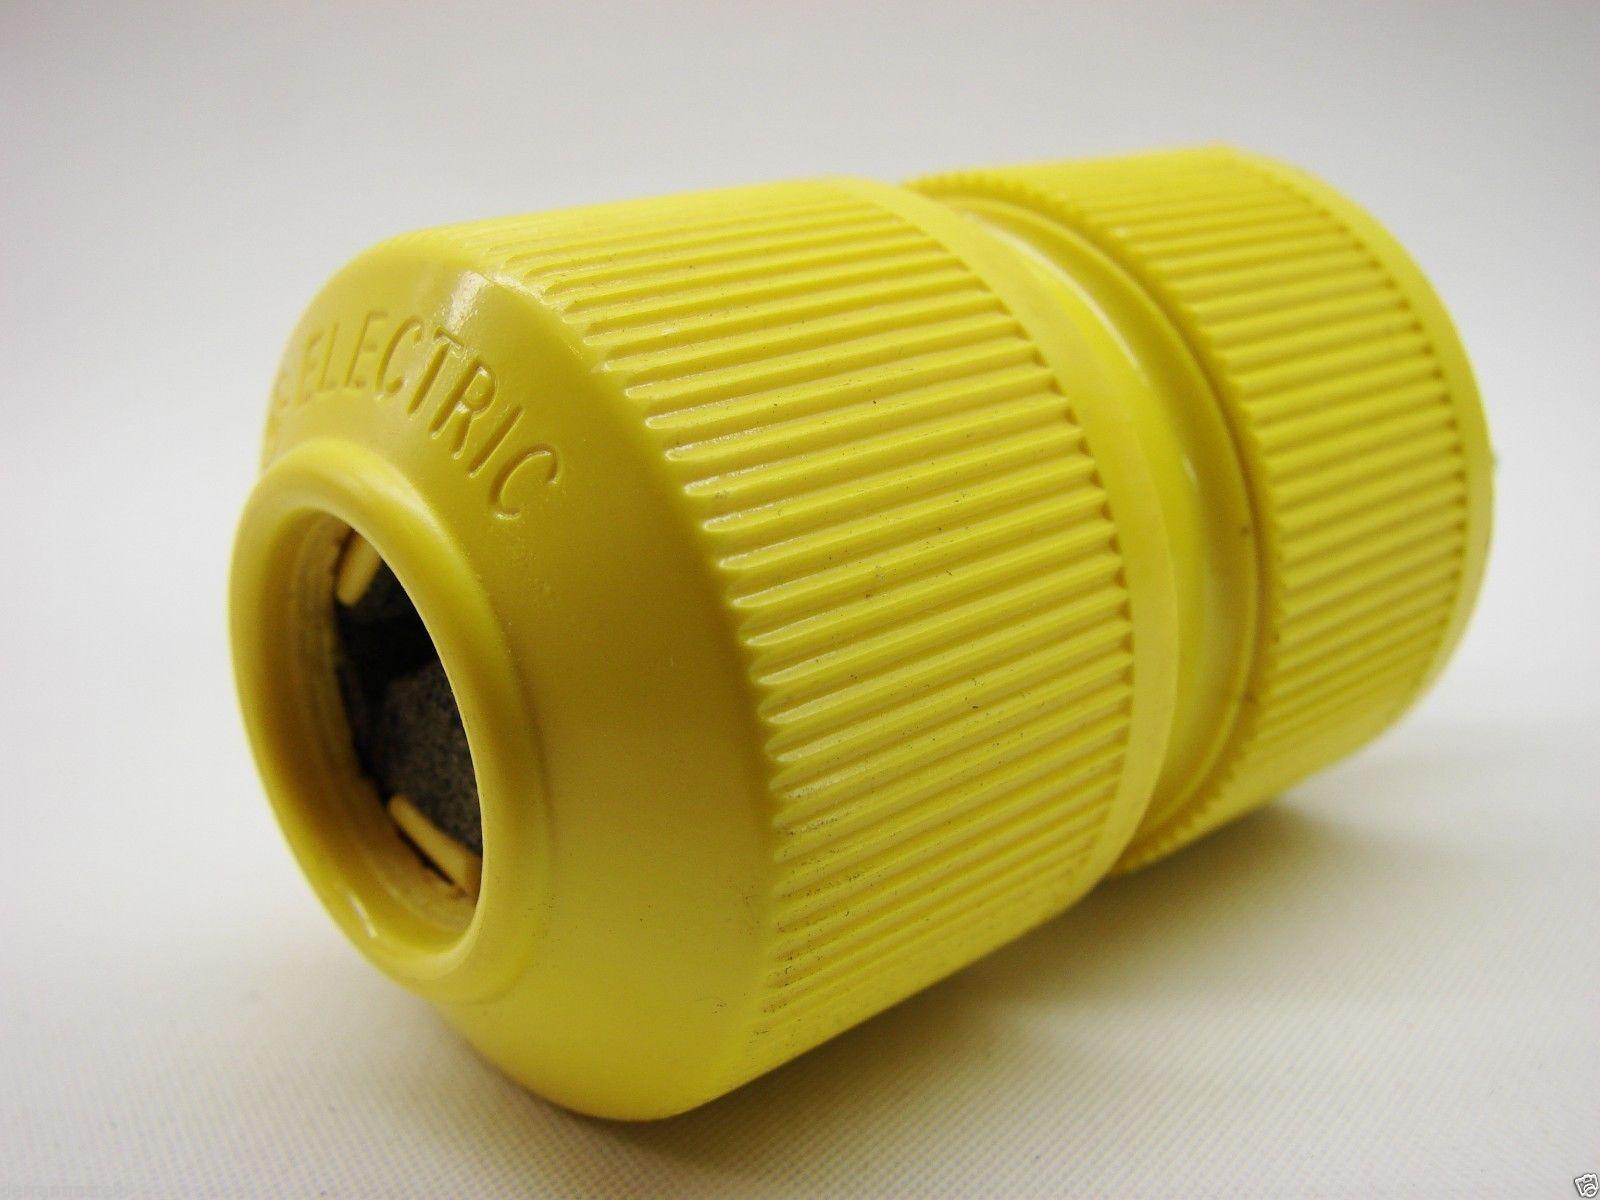 GE Plug GED-0621 Dyna-Mate II 250V 20A 2P/3W T-Slot NEMA 6-20P bb13